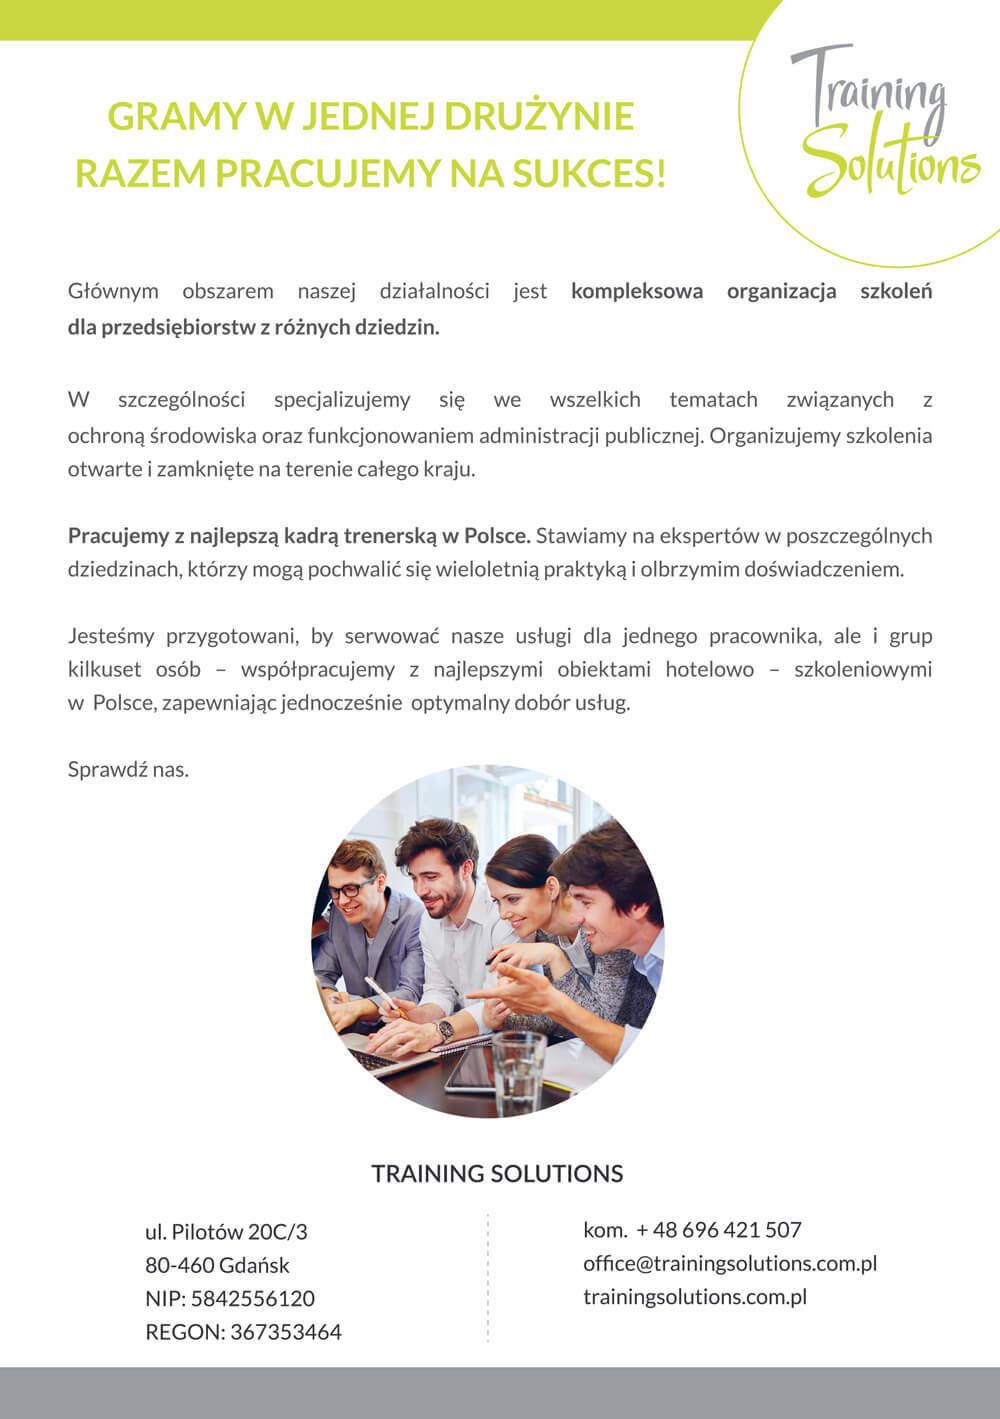 Ulotka Training Solutions A5 - projekt graficzny